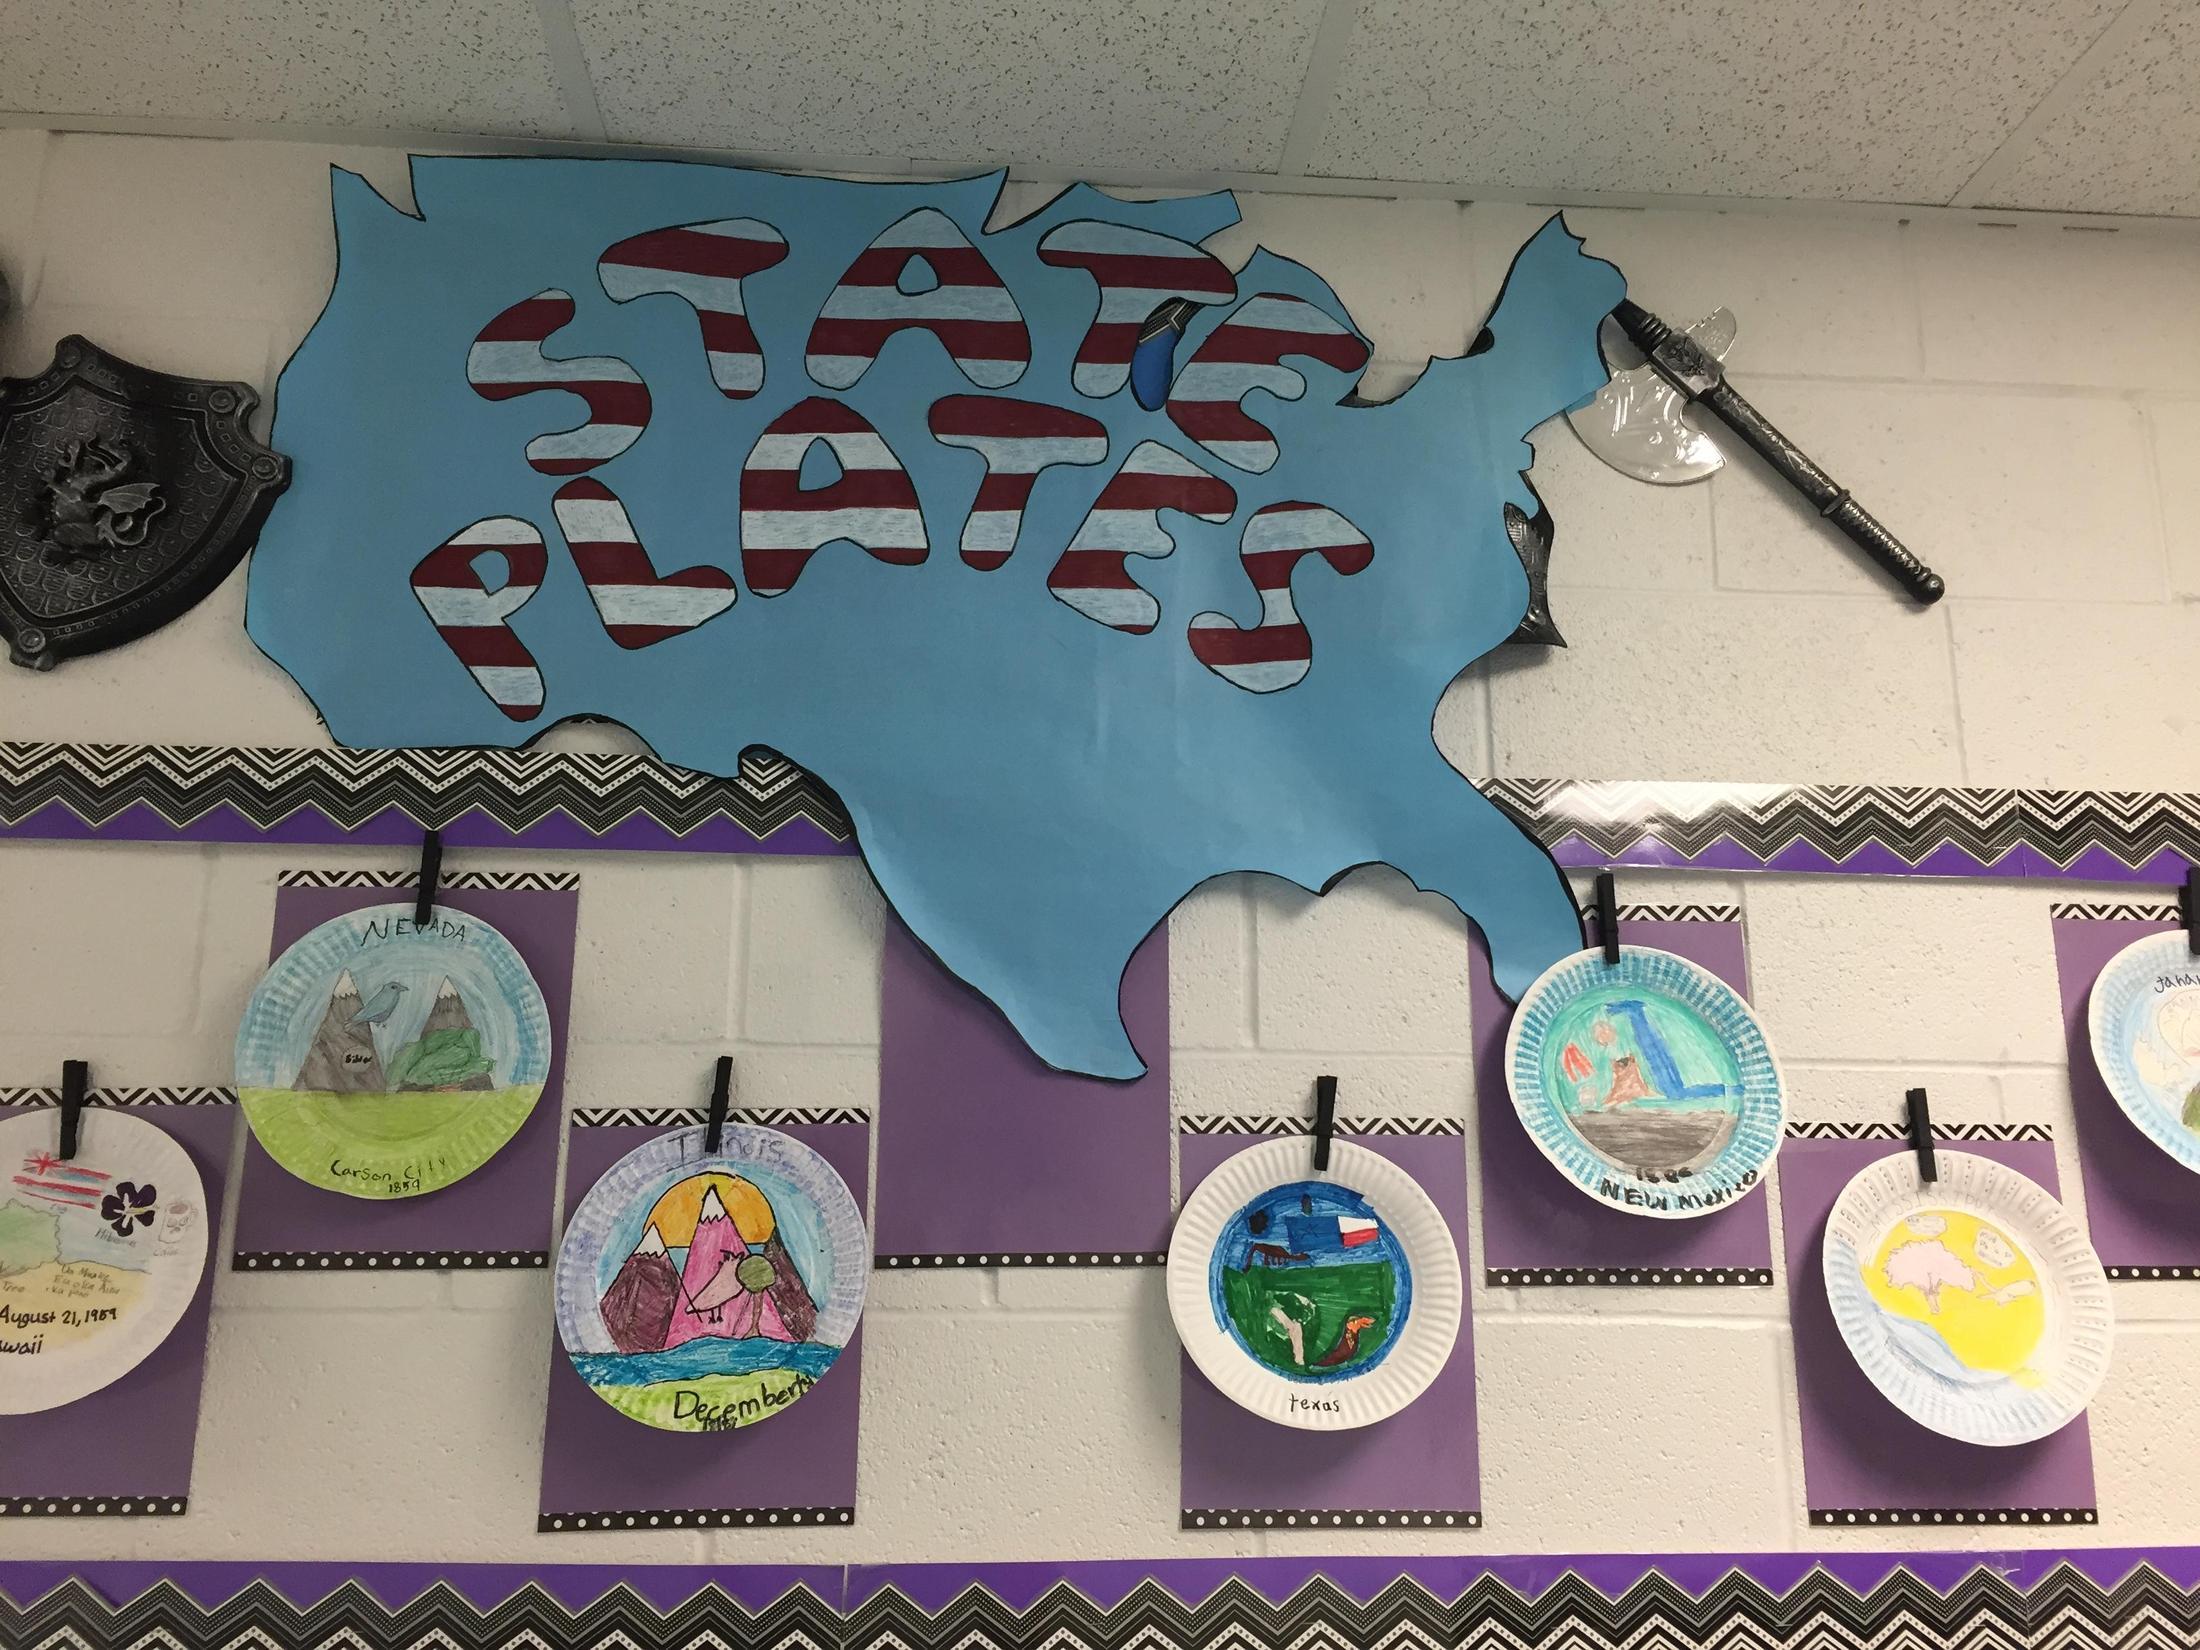 Rose Home Page – Mrs. Vivian Rose – Northlake Elementary School